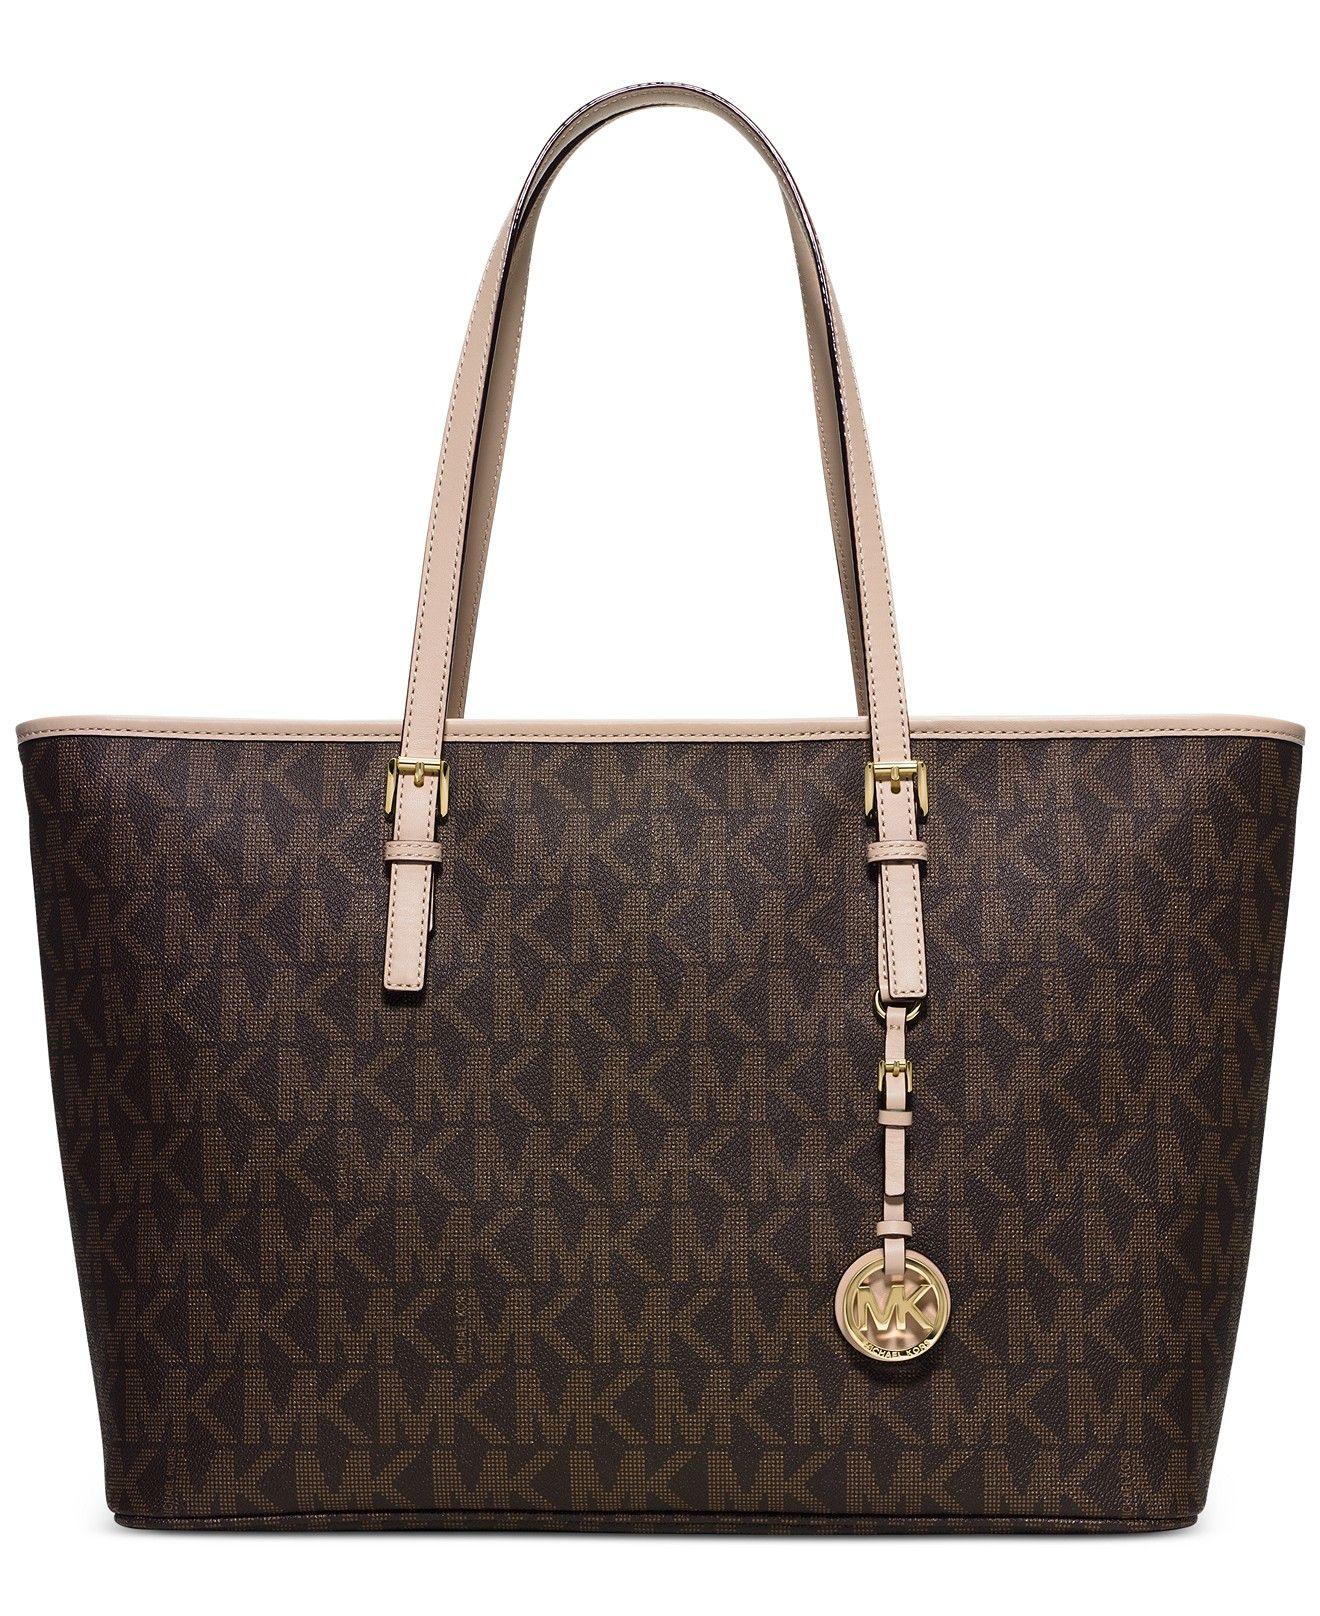 36068181d MICHAEL Michael Kors Jet Set Travel Medium Top Zip Multifunction Tote - Michael  Kors Handbags - Handbags Accessories - Macys